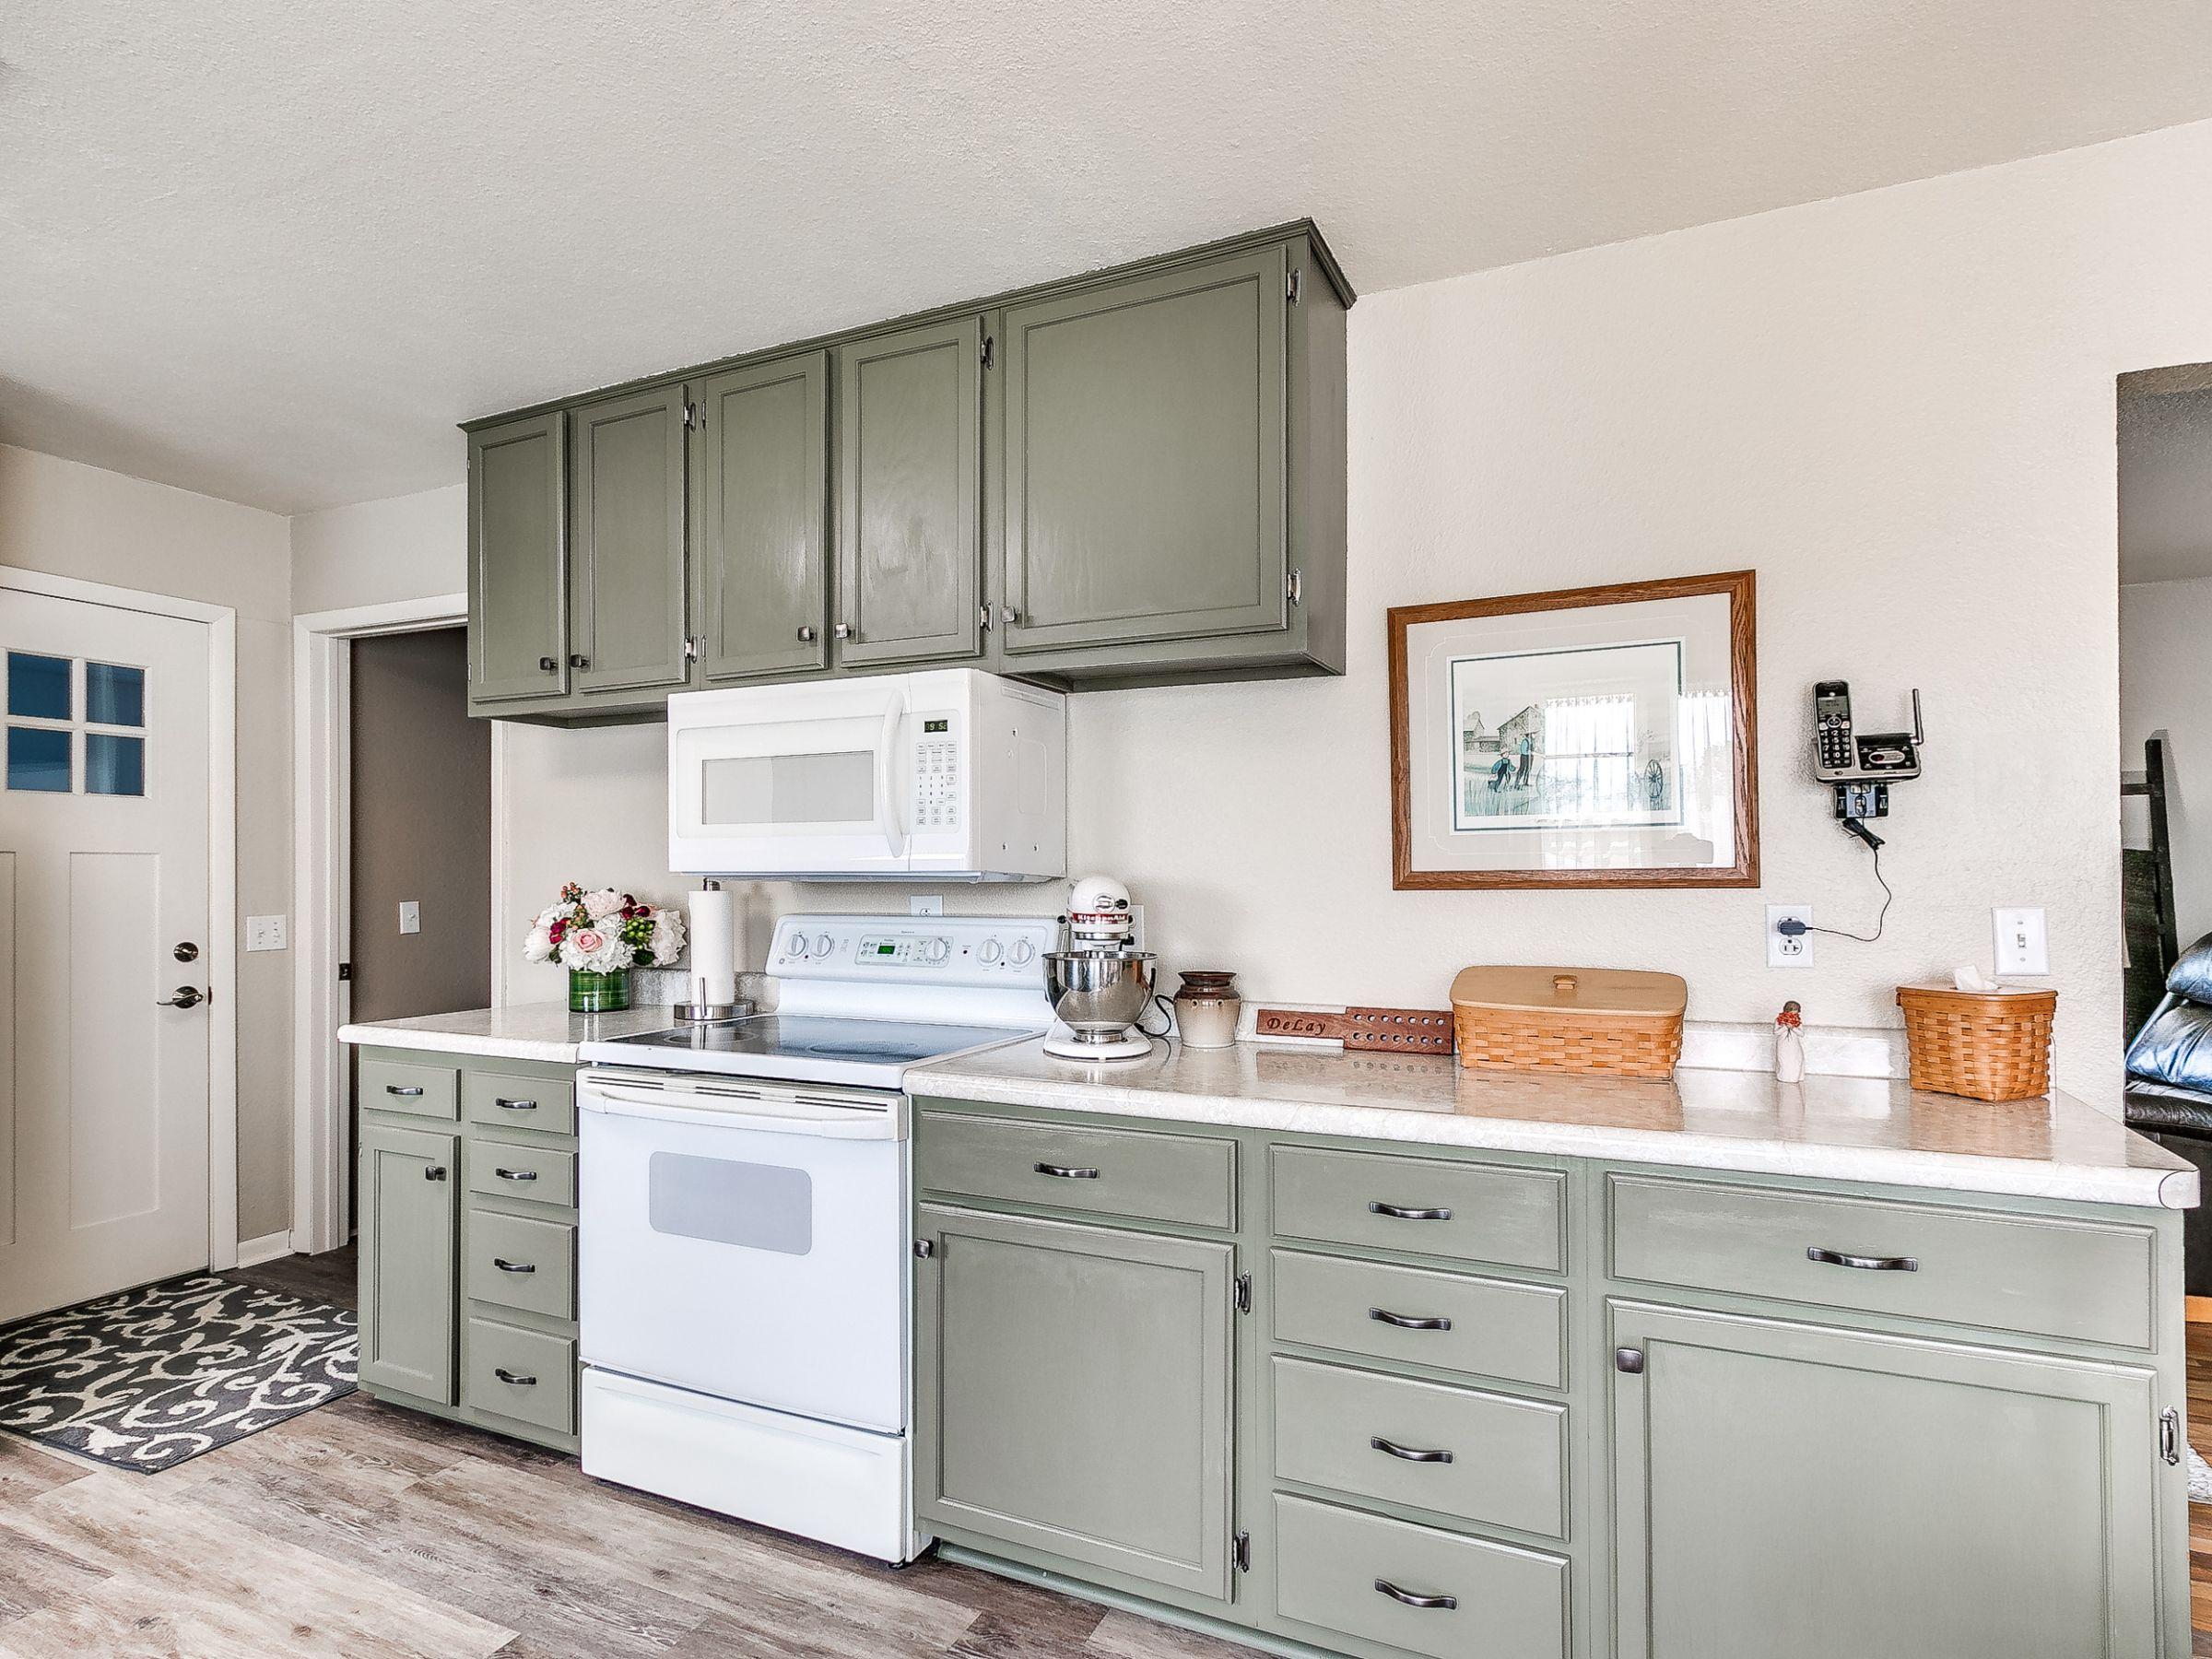 residential-warren-county-iowa-3-acres-listing-number-15516-6-2021-05-12-145109.jpg